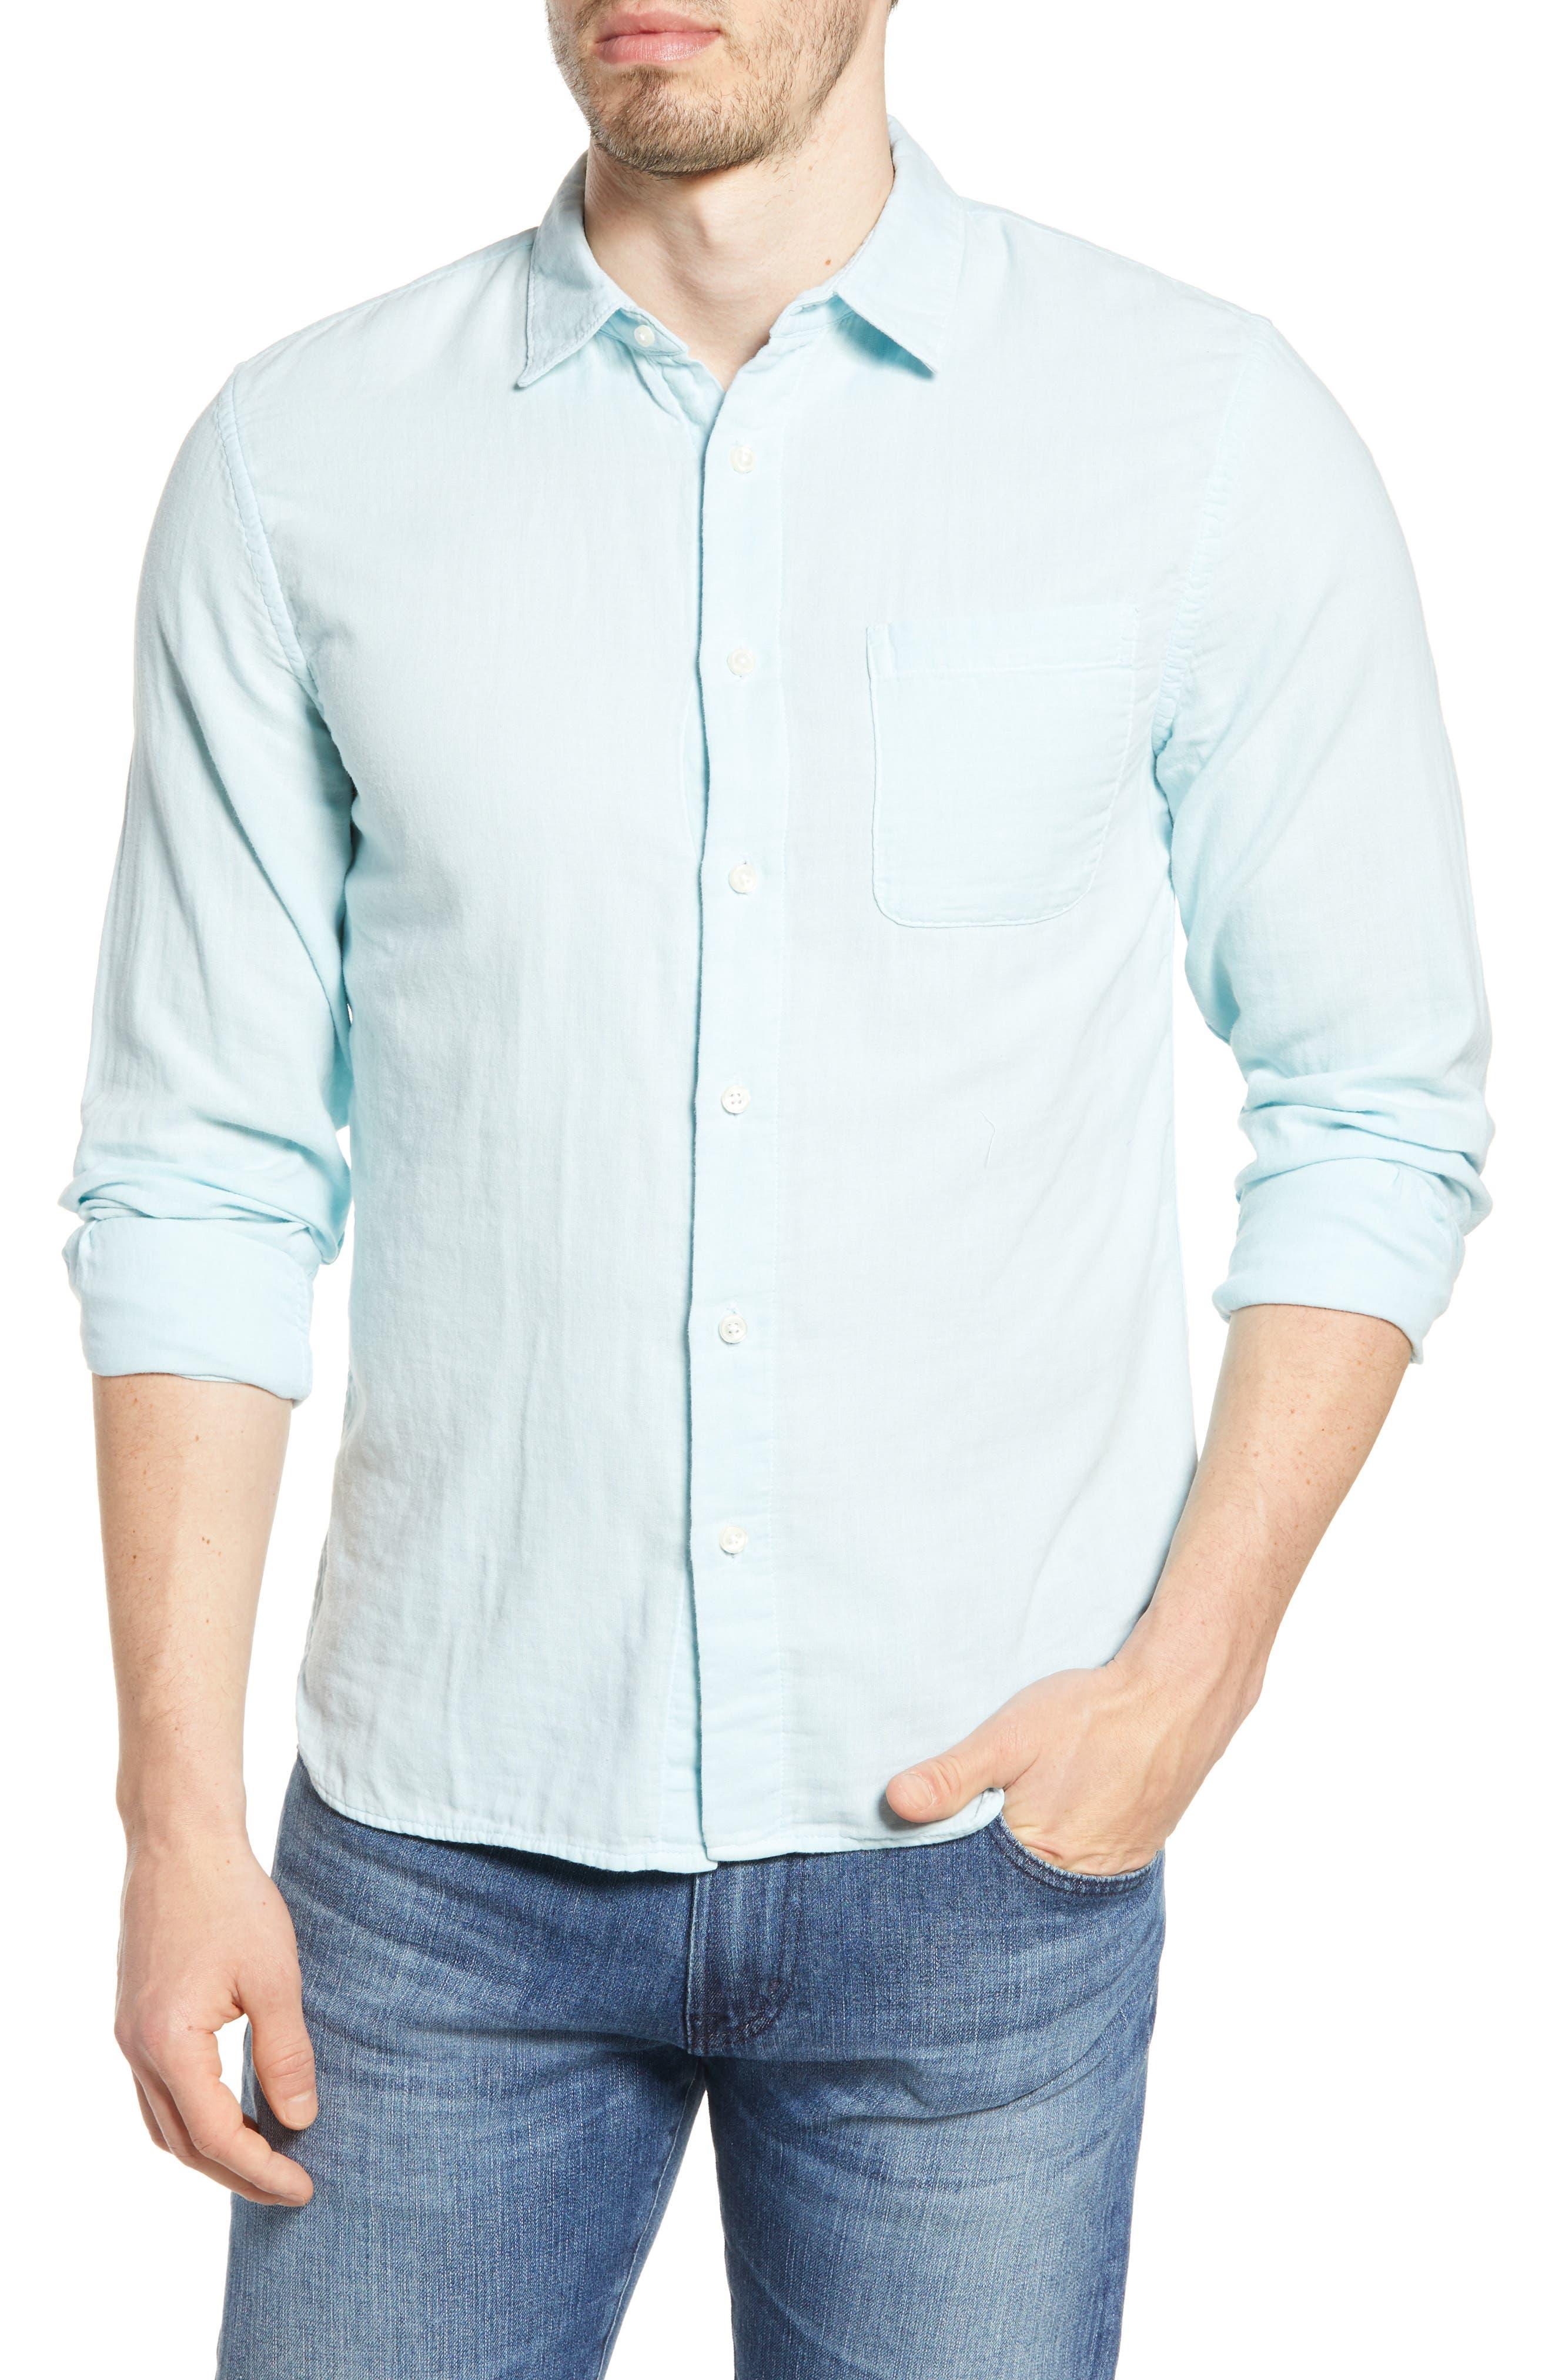 The Ripper Button-Up Organic Cotton Gauze Shirt